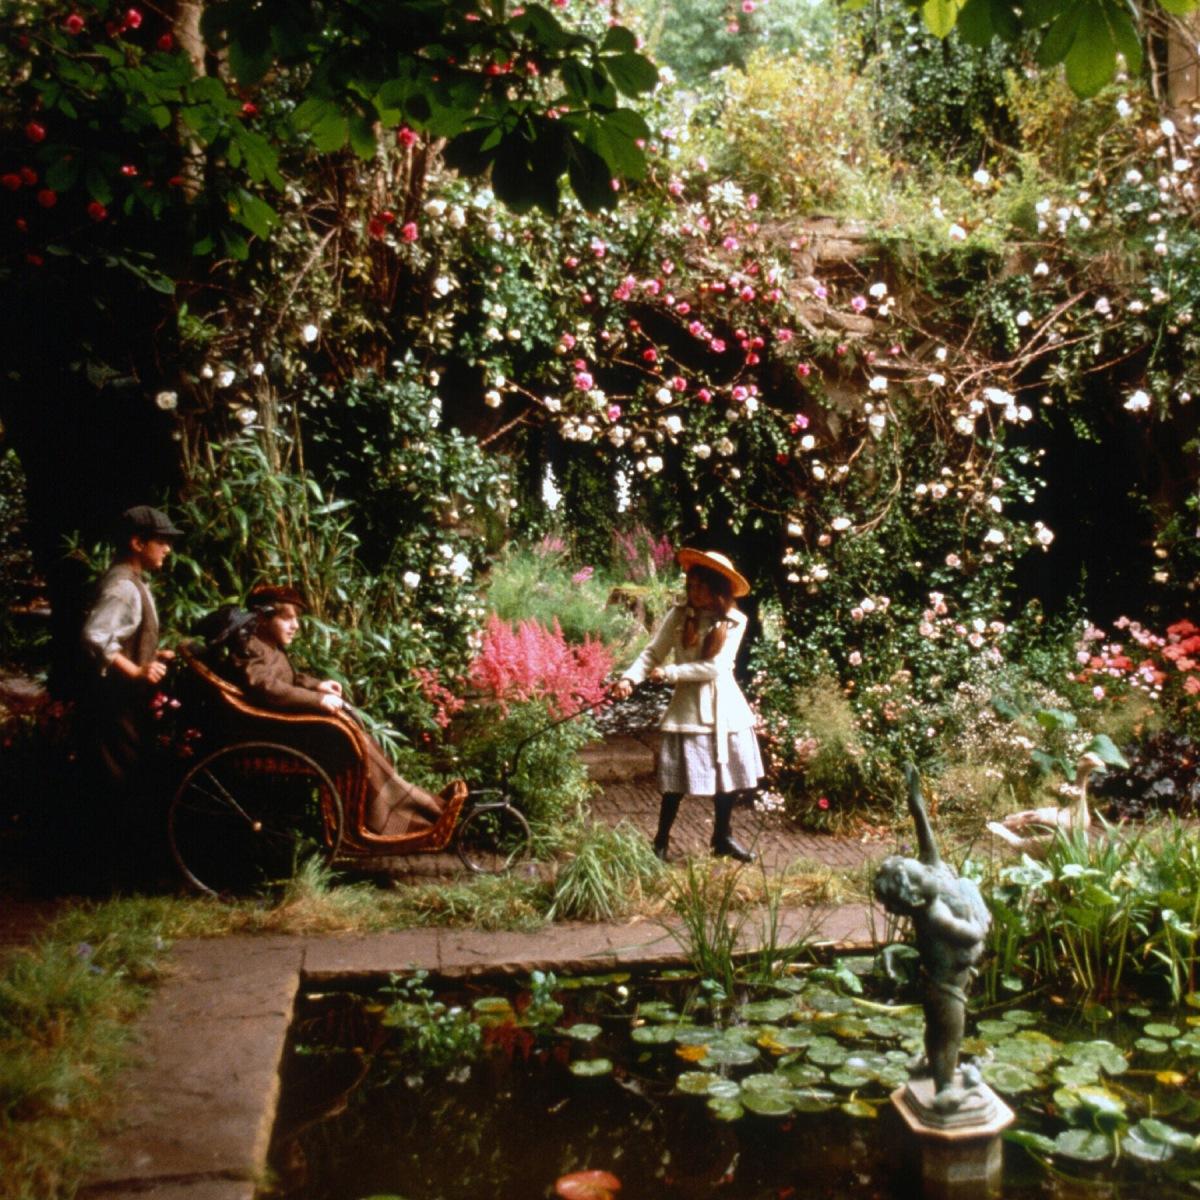 Menjelajahi Secret Garden Lewat Literatur